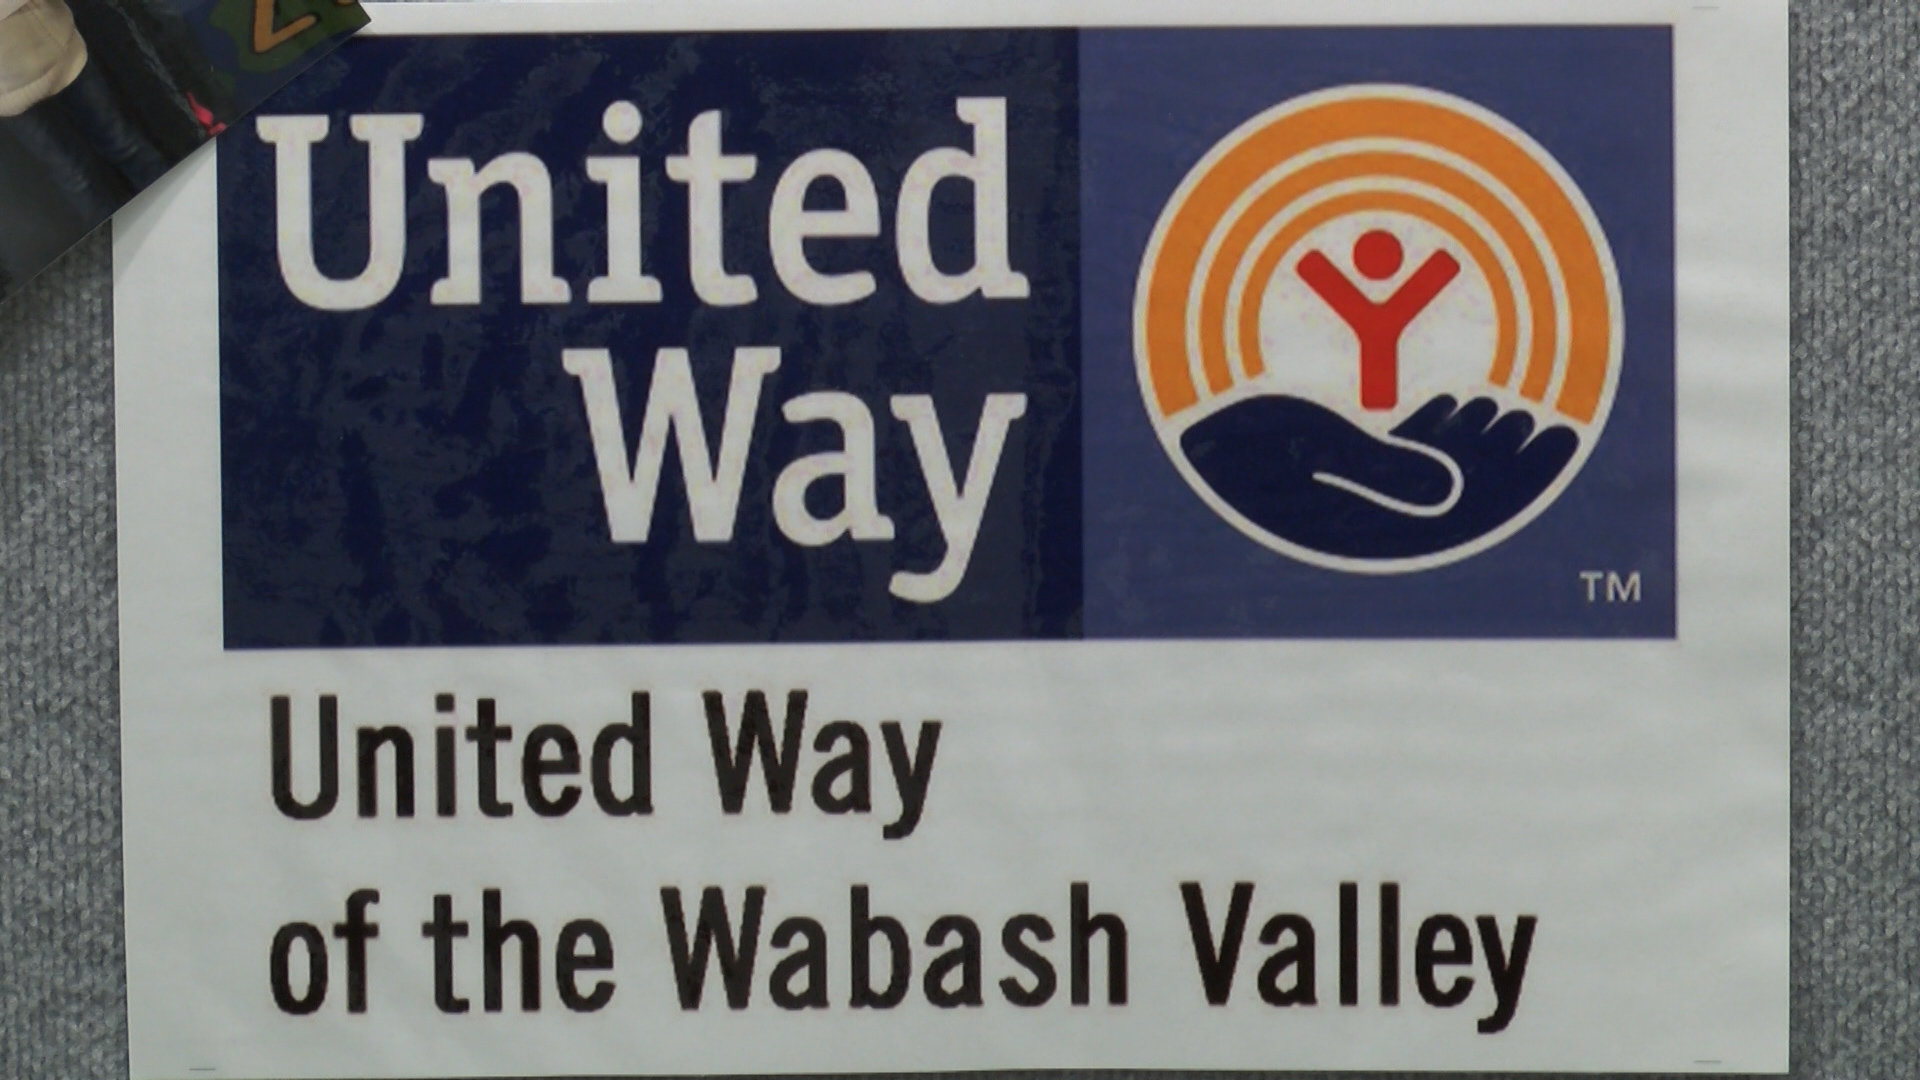 united way_1455247264720.jpg